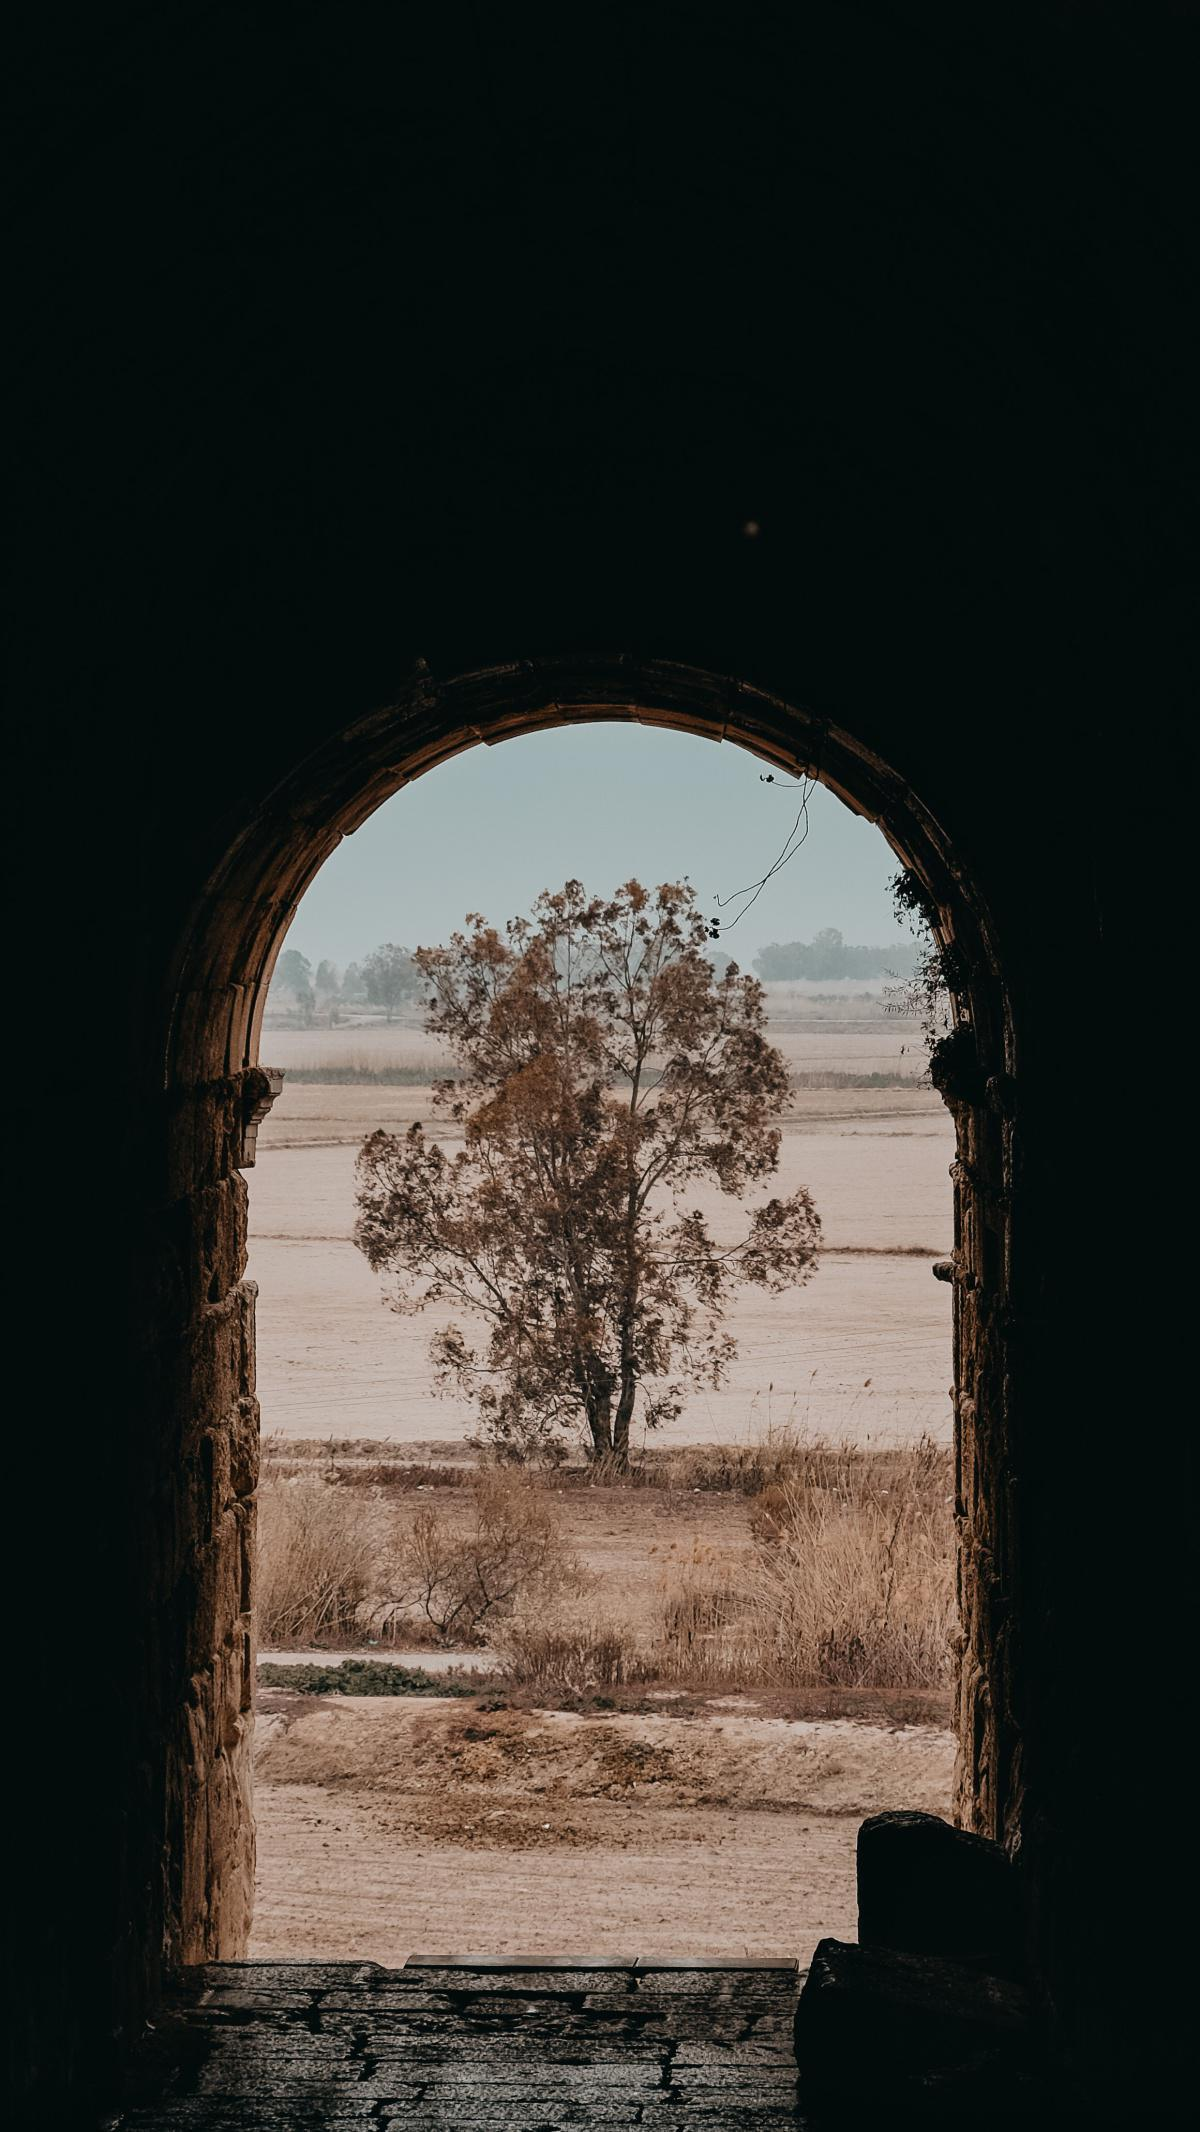 Erleuchtung - Der zentrale Punkt